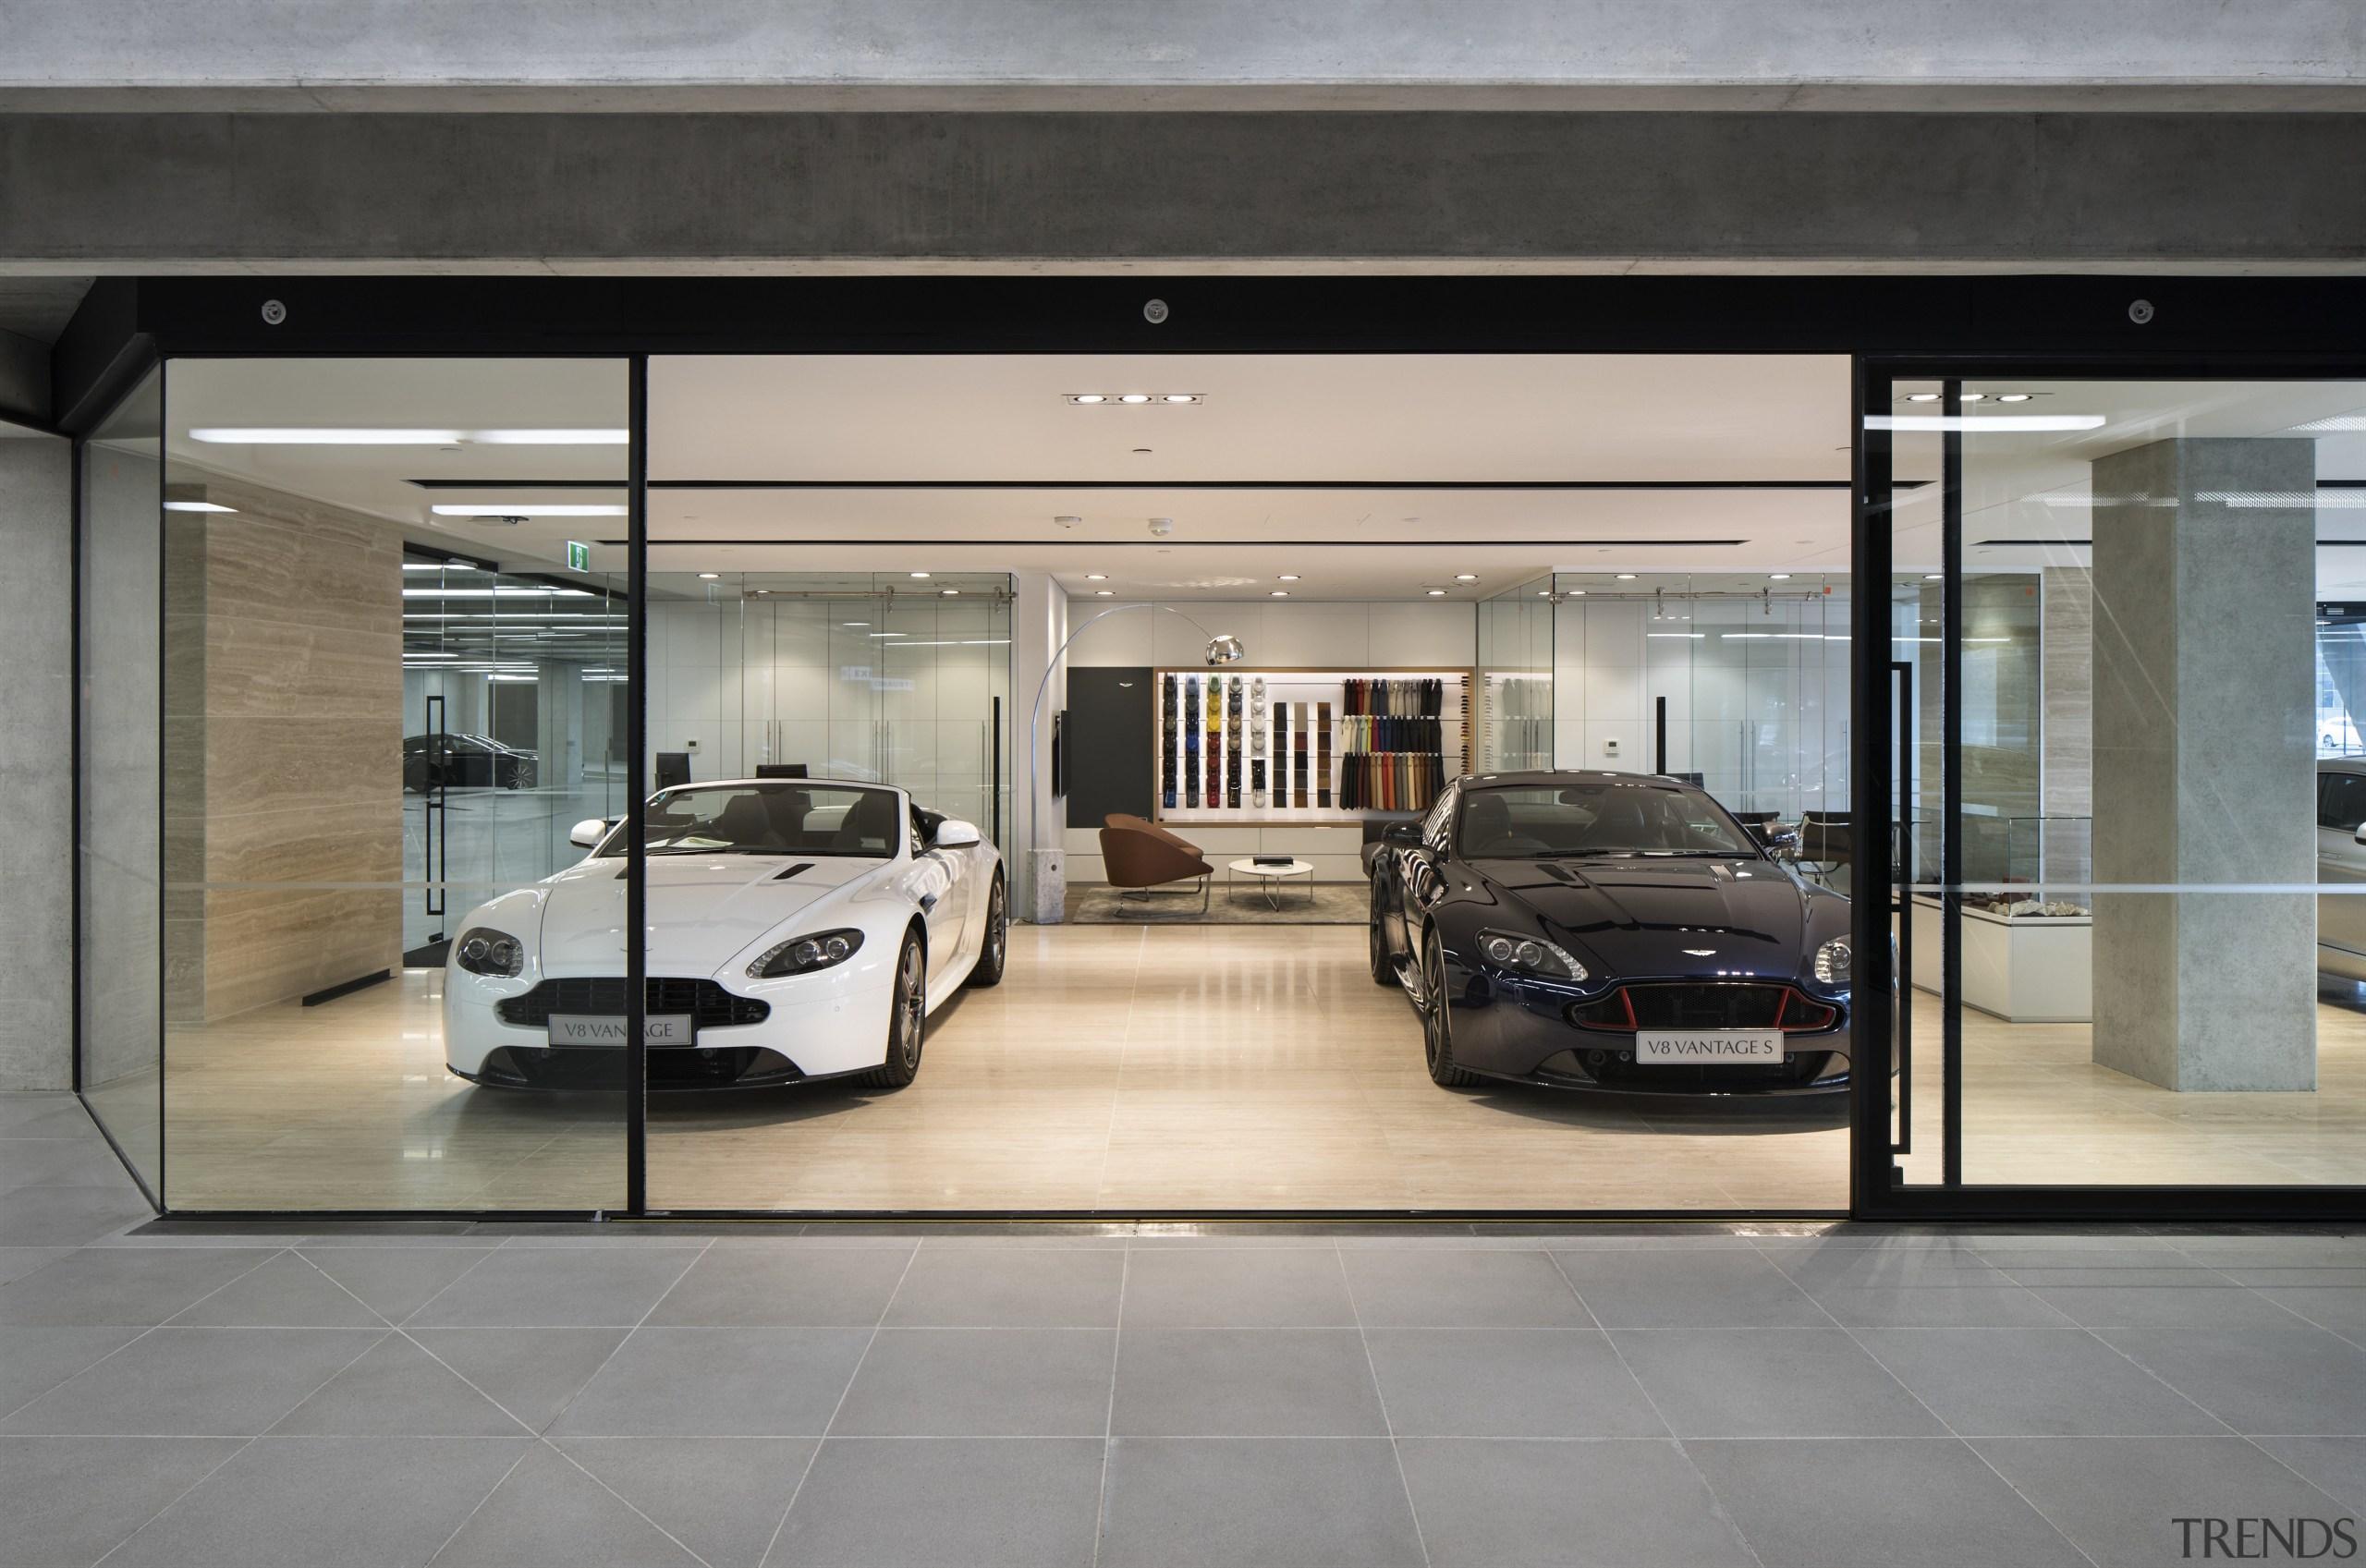 Pre-owned vehicles are displayed on the upper showroom automotive design, bmw, building, car, car dealership, door, executive car, floor, glass, interior design, luxury vehicle, motor vehicle, vehicle, vehicle door, gray